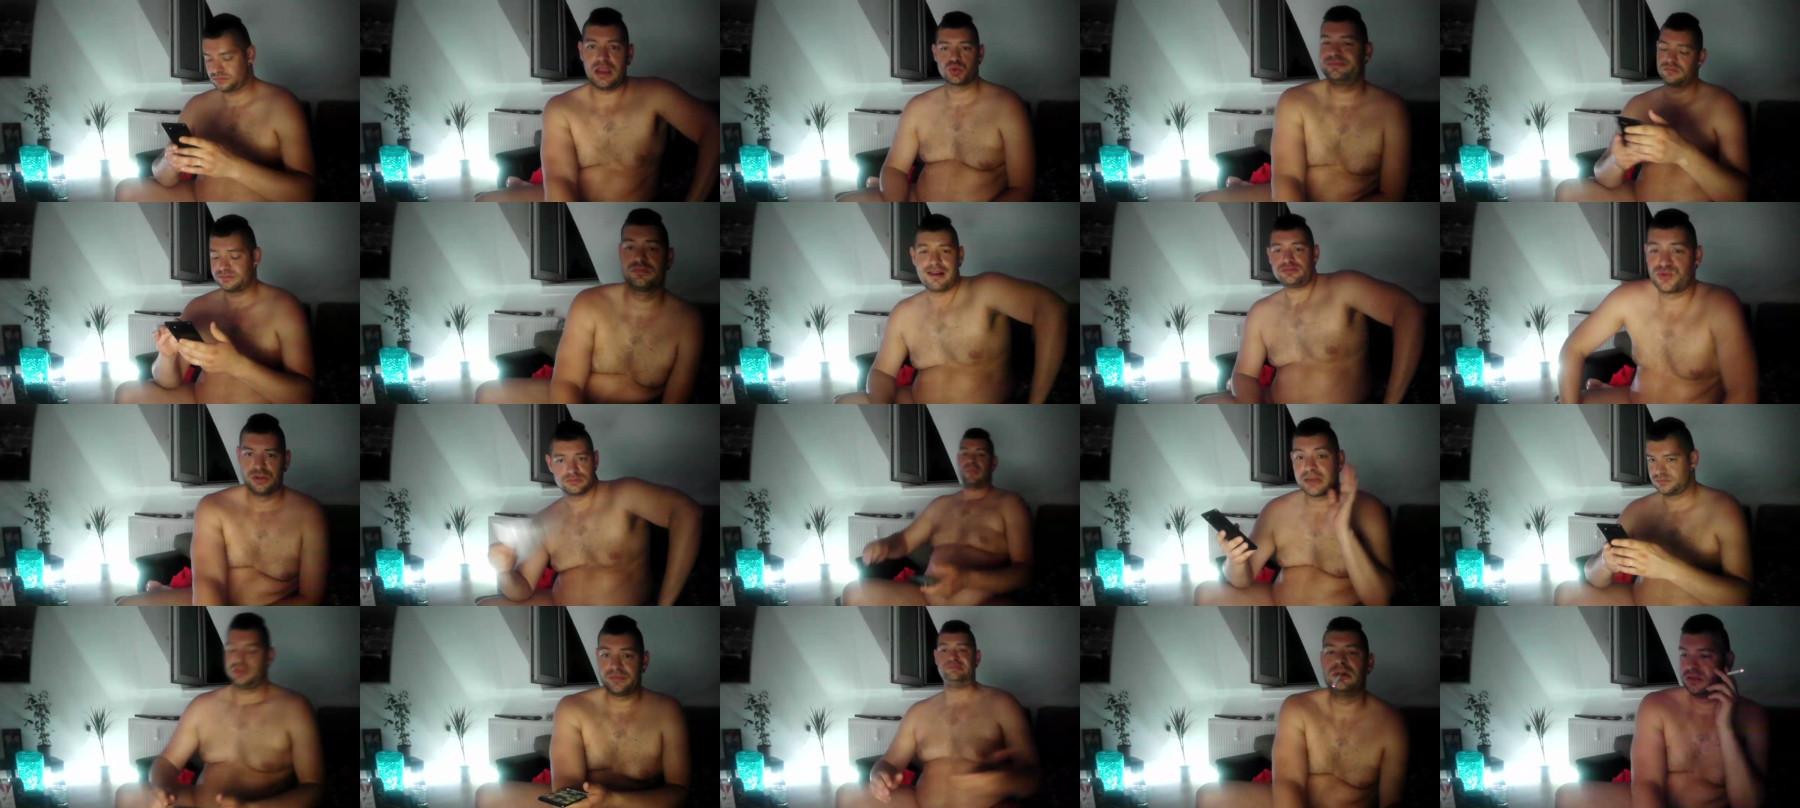 ben198932 Topless CAM SHOW @ Cam4 18-06-2021